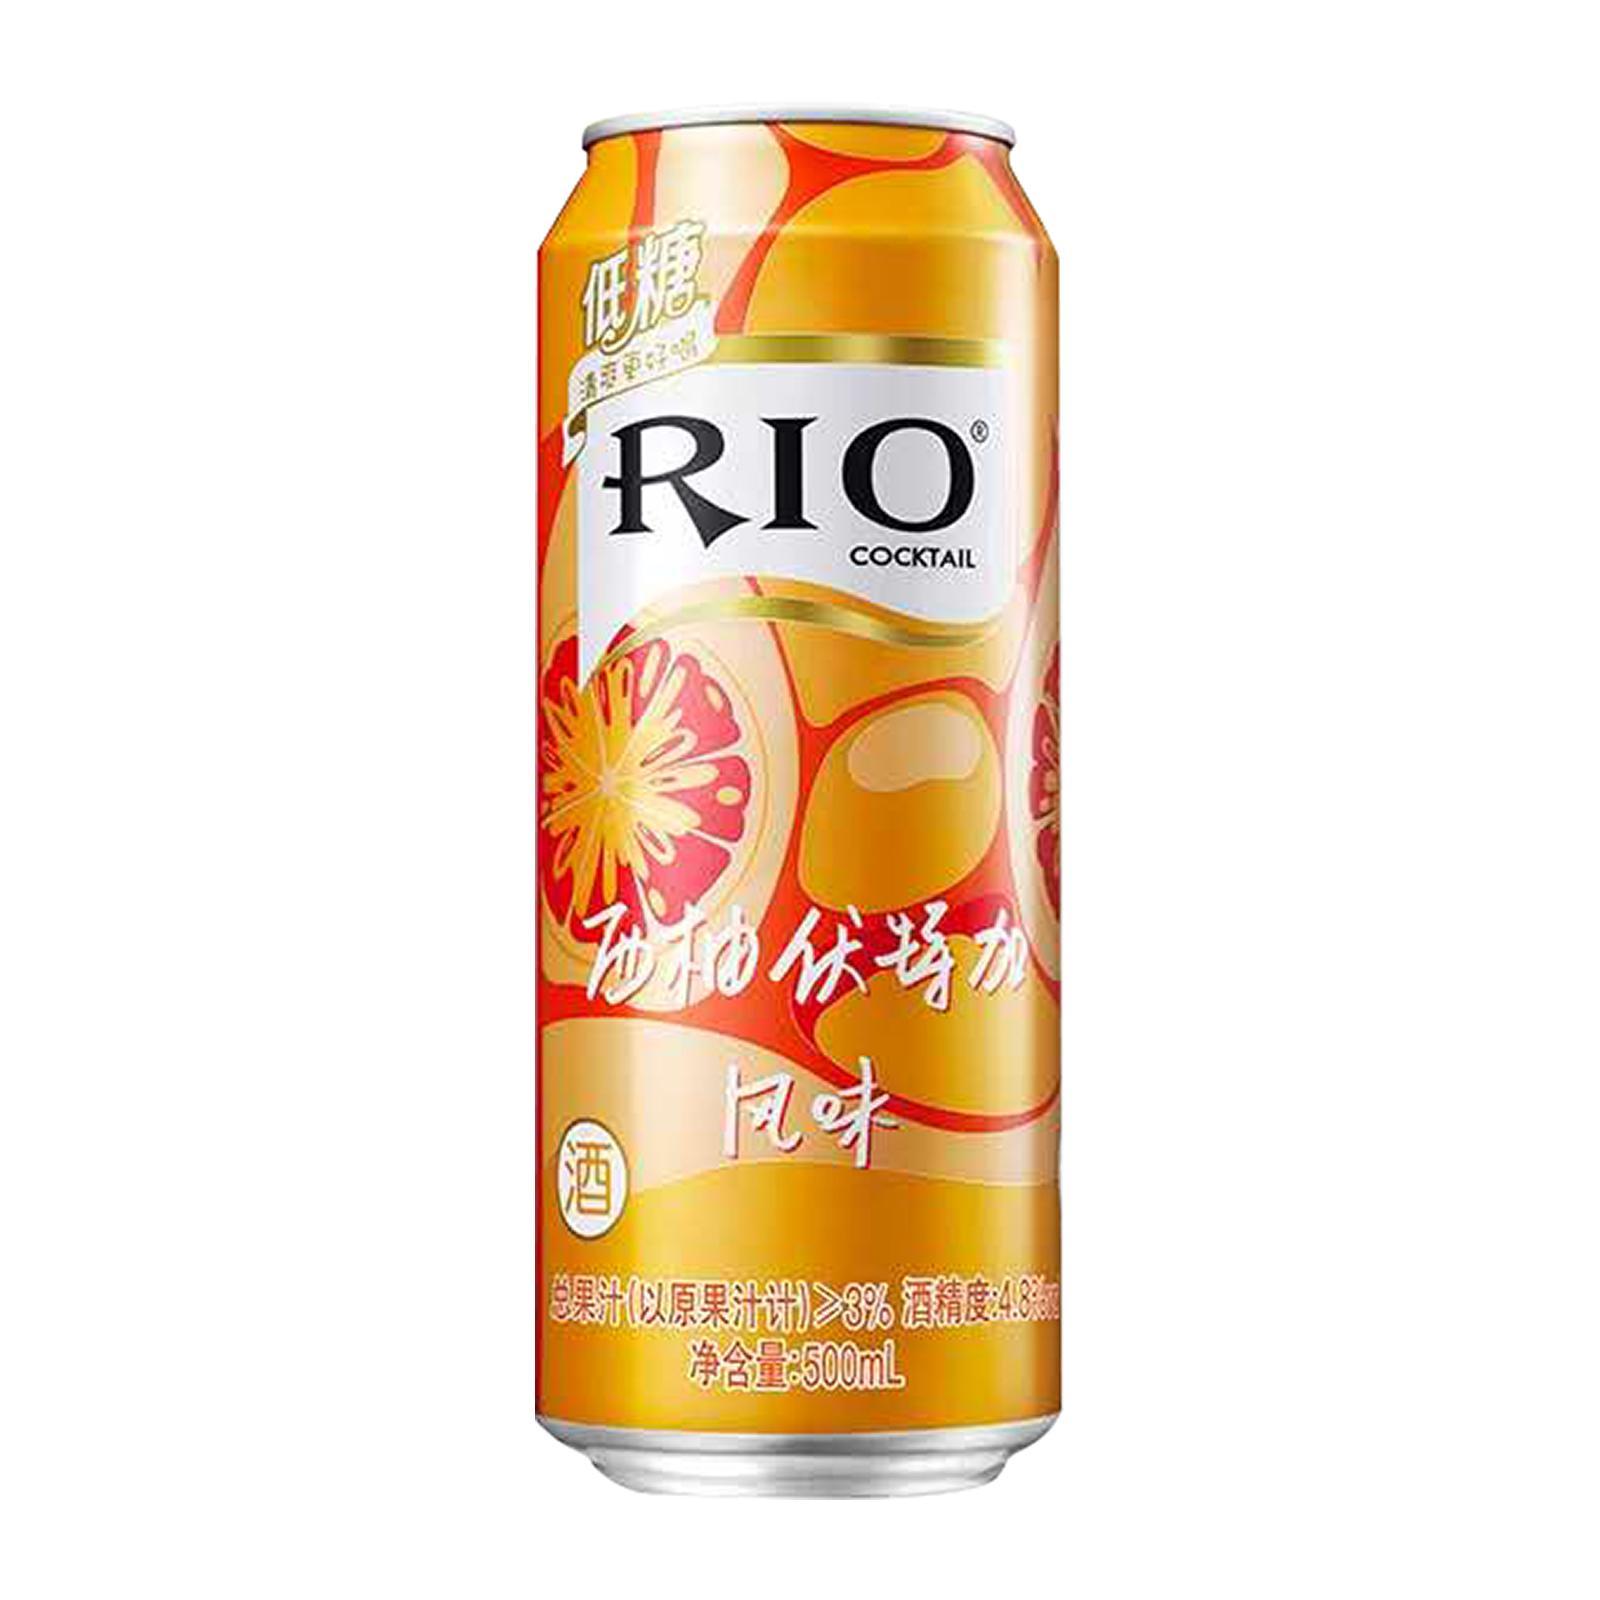 Rio Cocktail Grapefruit+Vodka 3.0% 500Ml